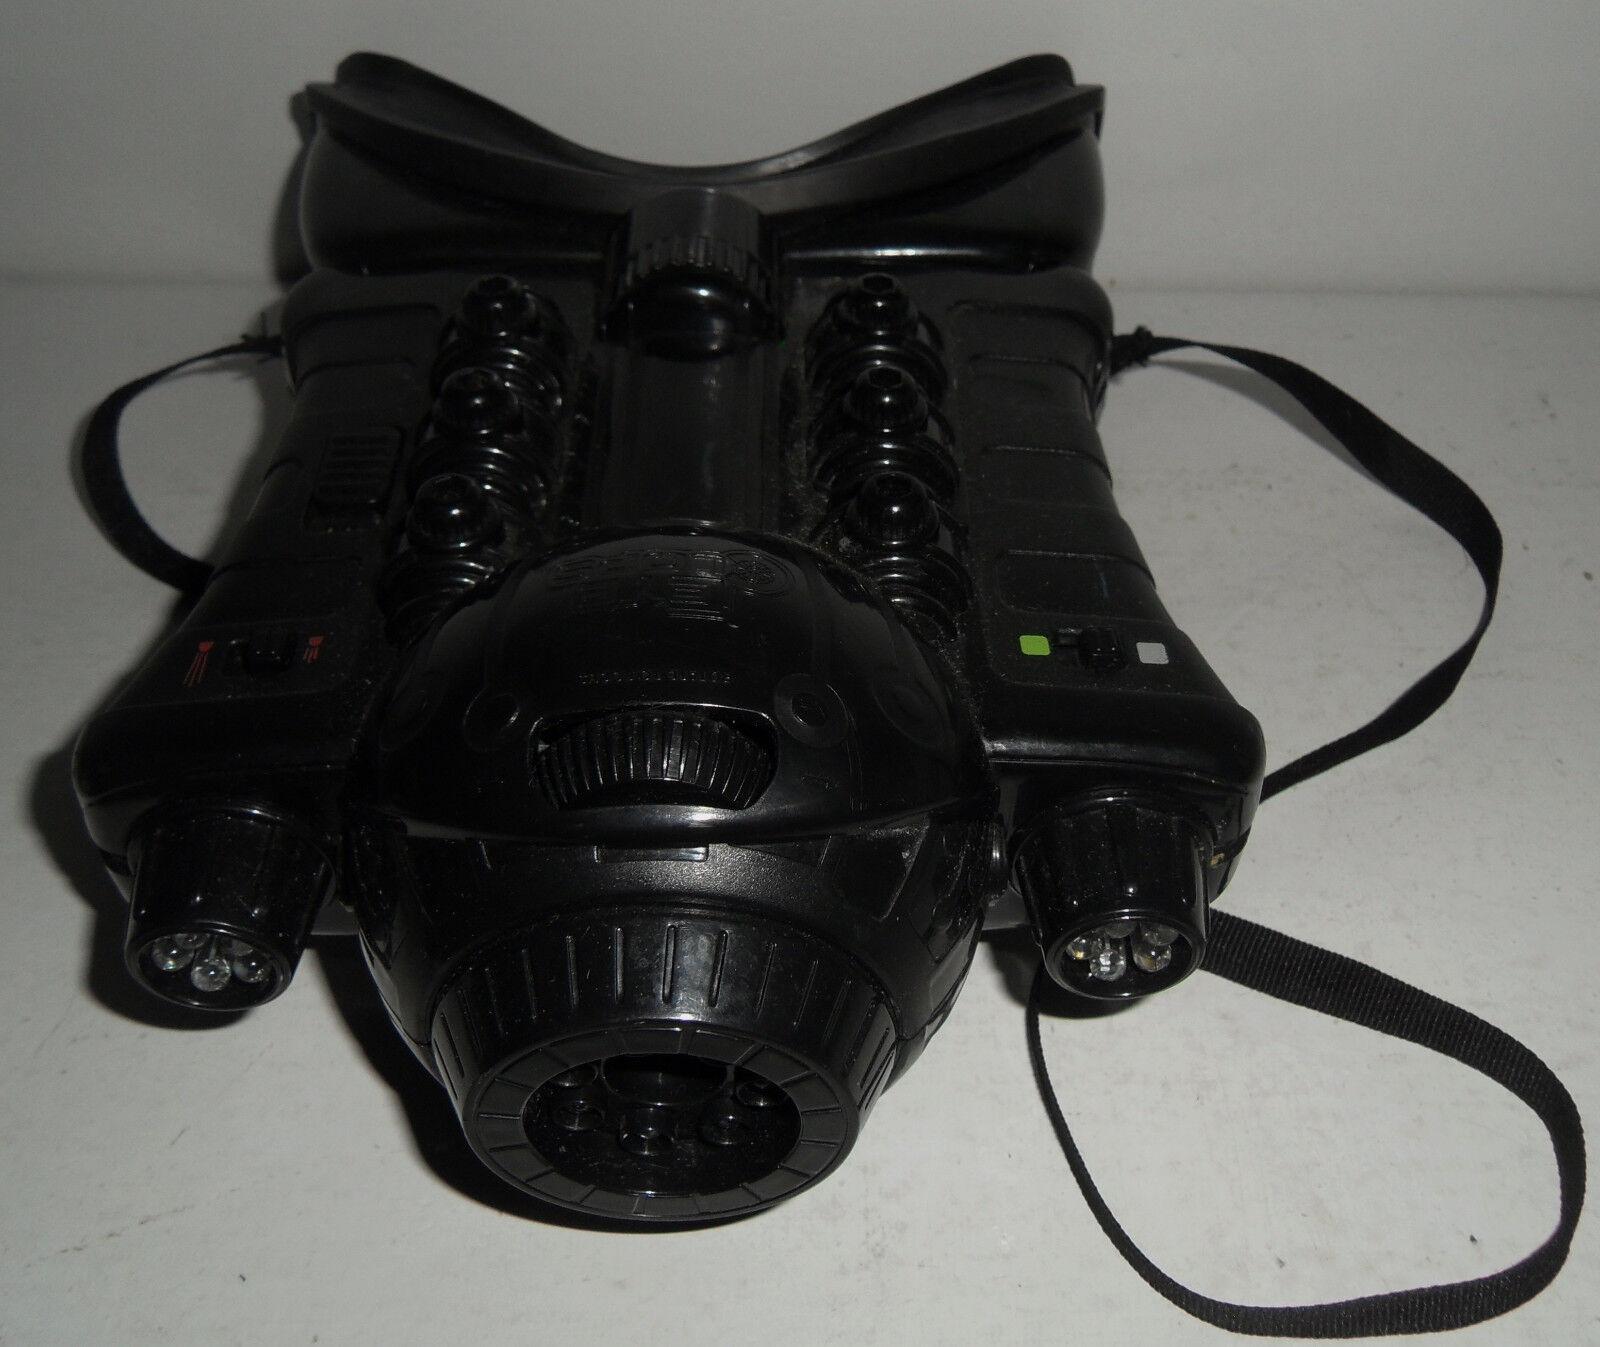 Eye Clops Night Vision Goggles Glasses Optics Jakks Pacific Fun  Eyeclops IR NVG